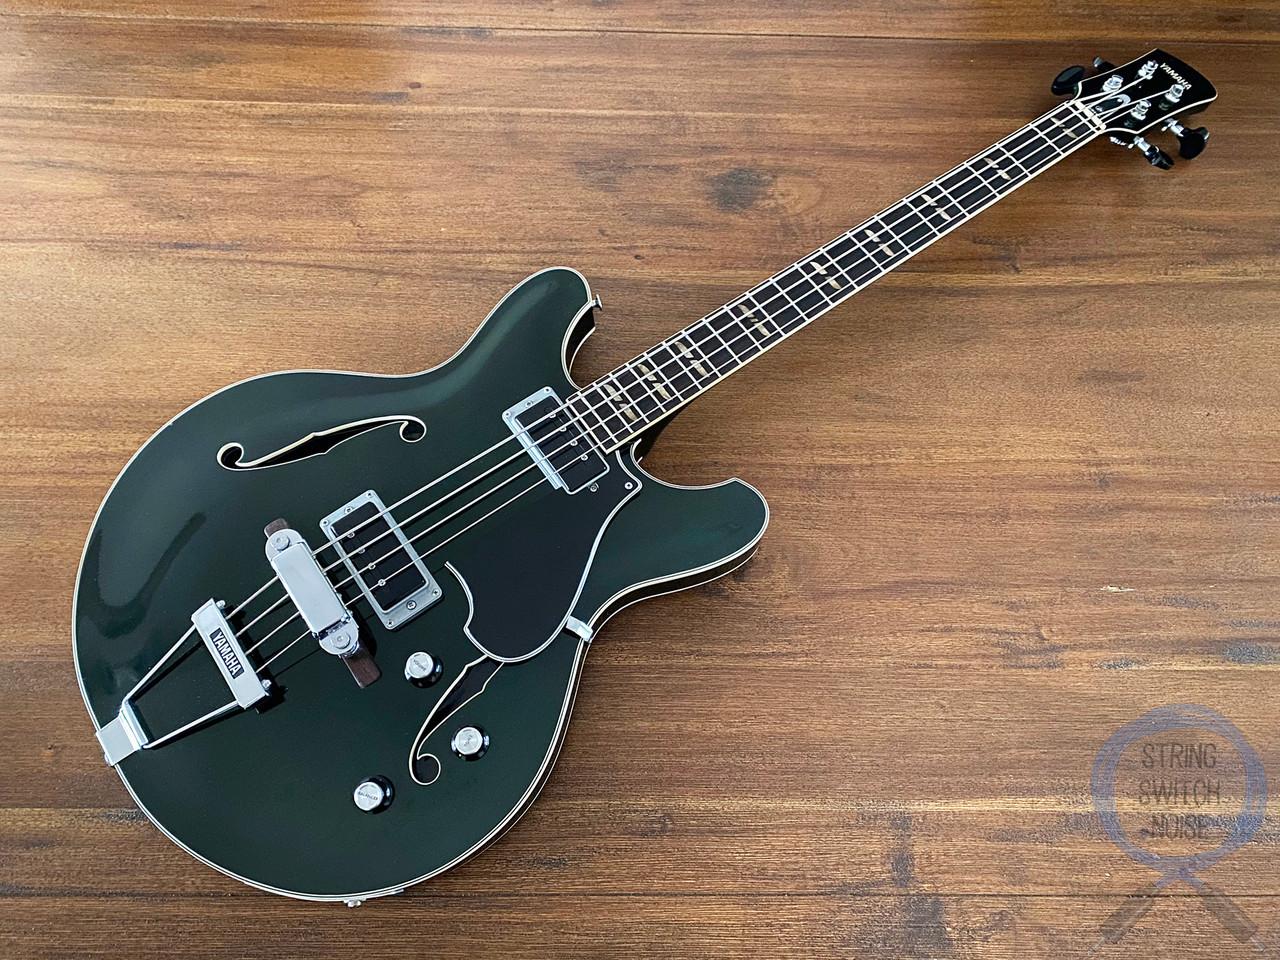 Yamaha SA-70, Full Hollow Body Bass, Forest Green, VINTAGE 1970